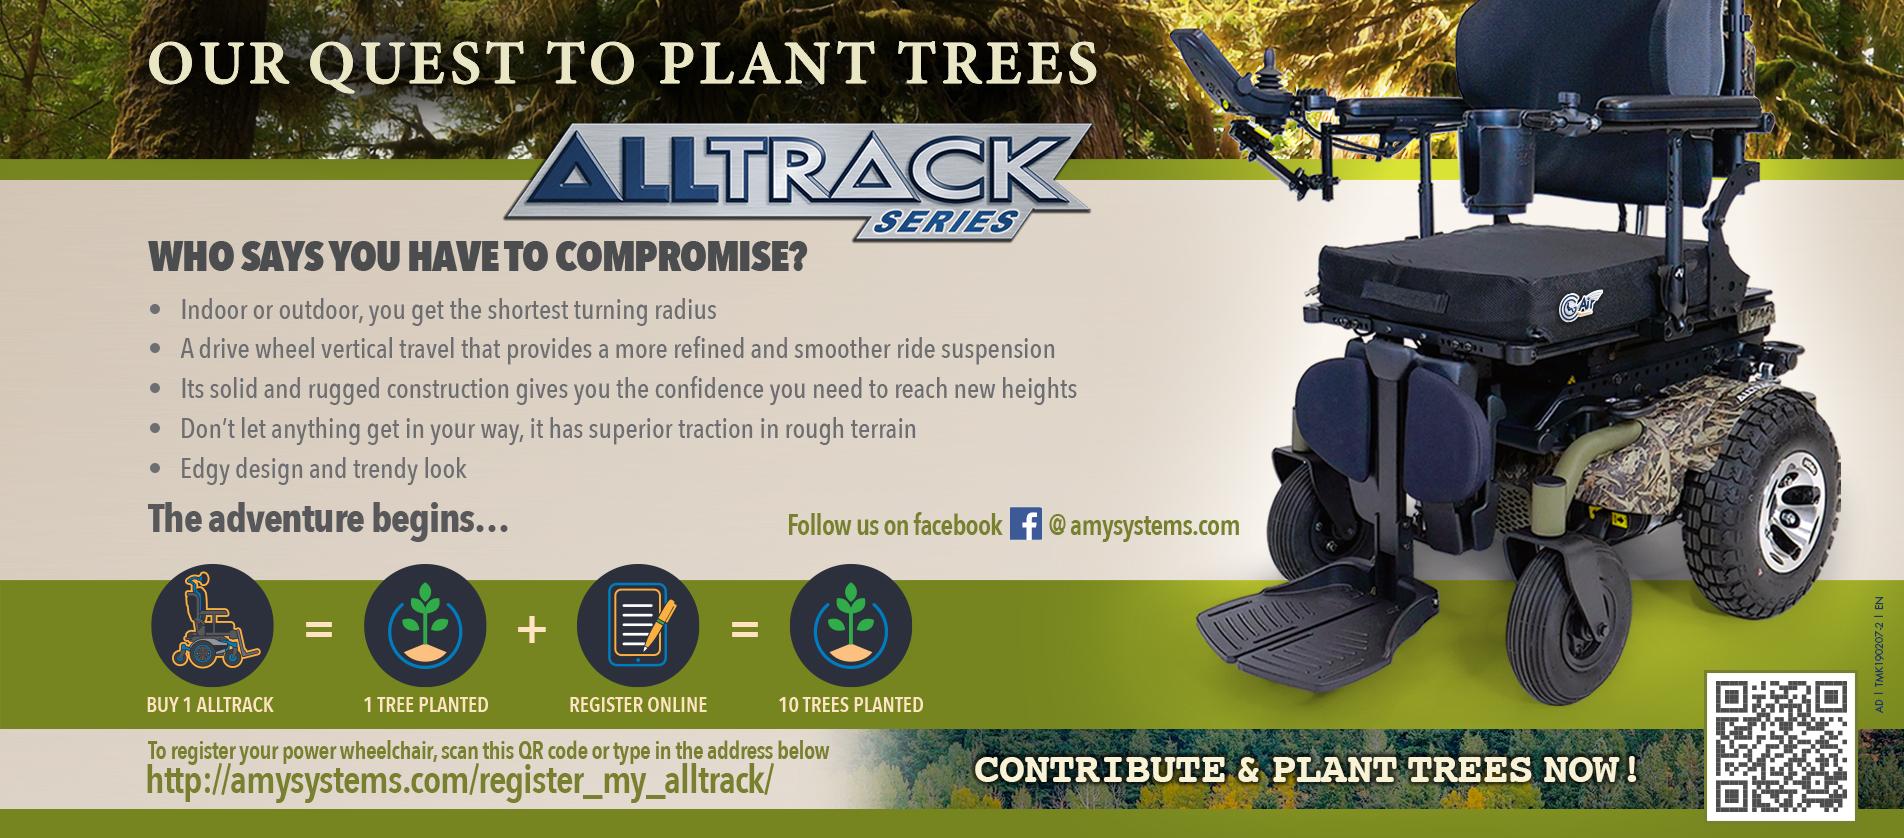 Power wheelchairs   Alltrack series   AMYLIOR   AMYSYSTEMS